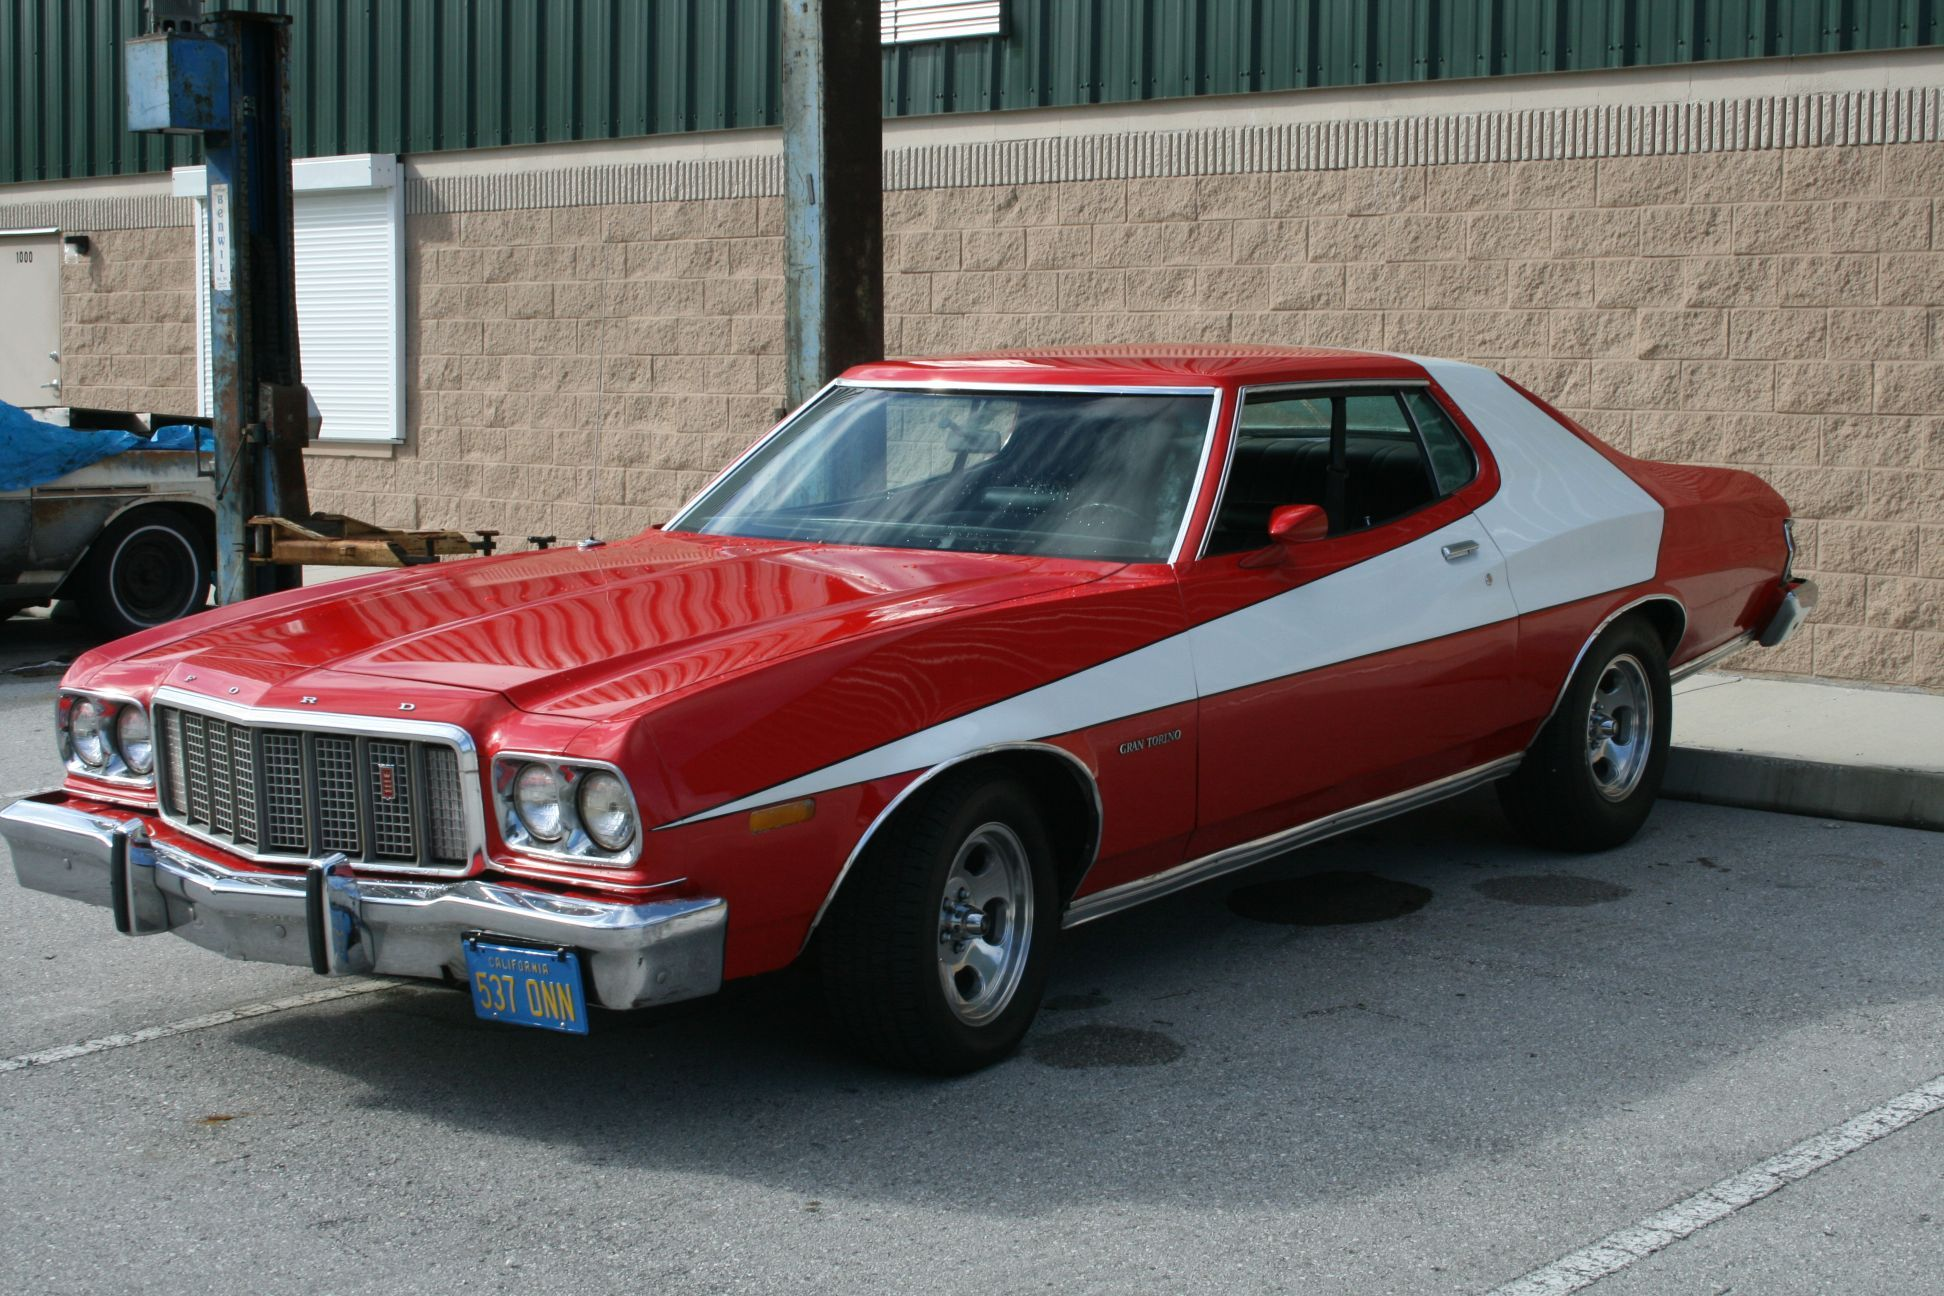 1976 Ford Gran Torino | awesome | Pinterest | Gran torino, Ford ...